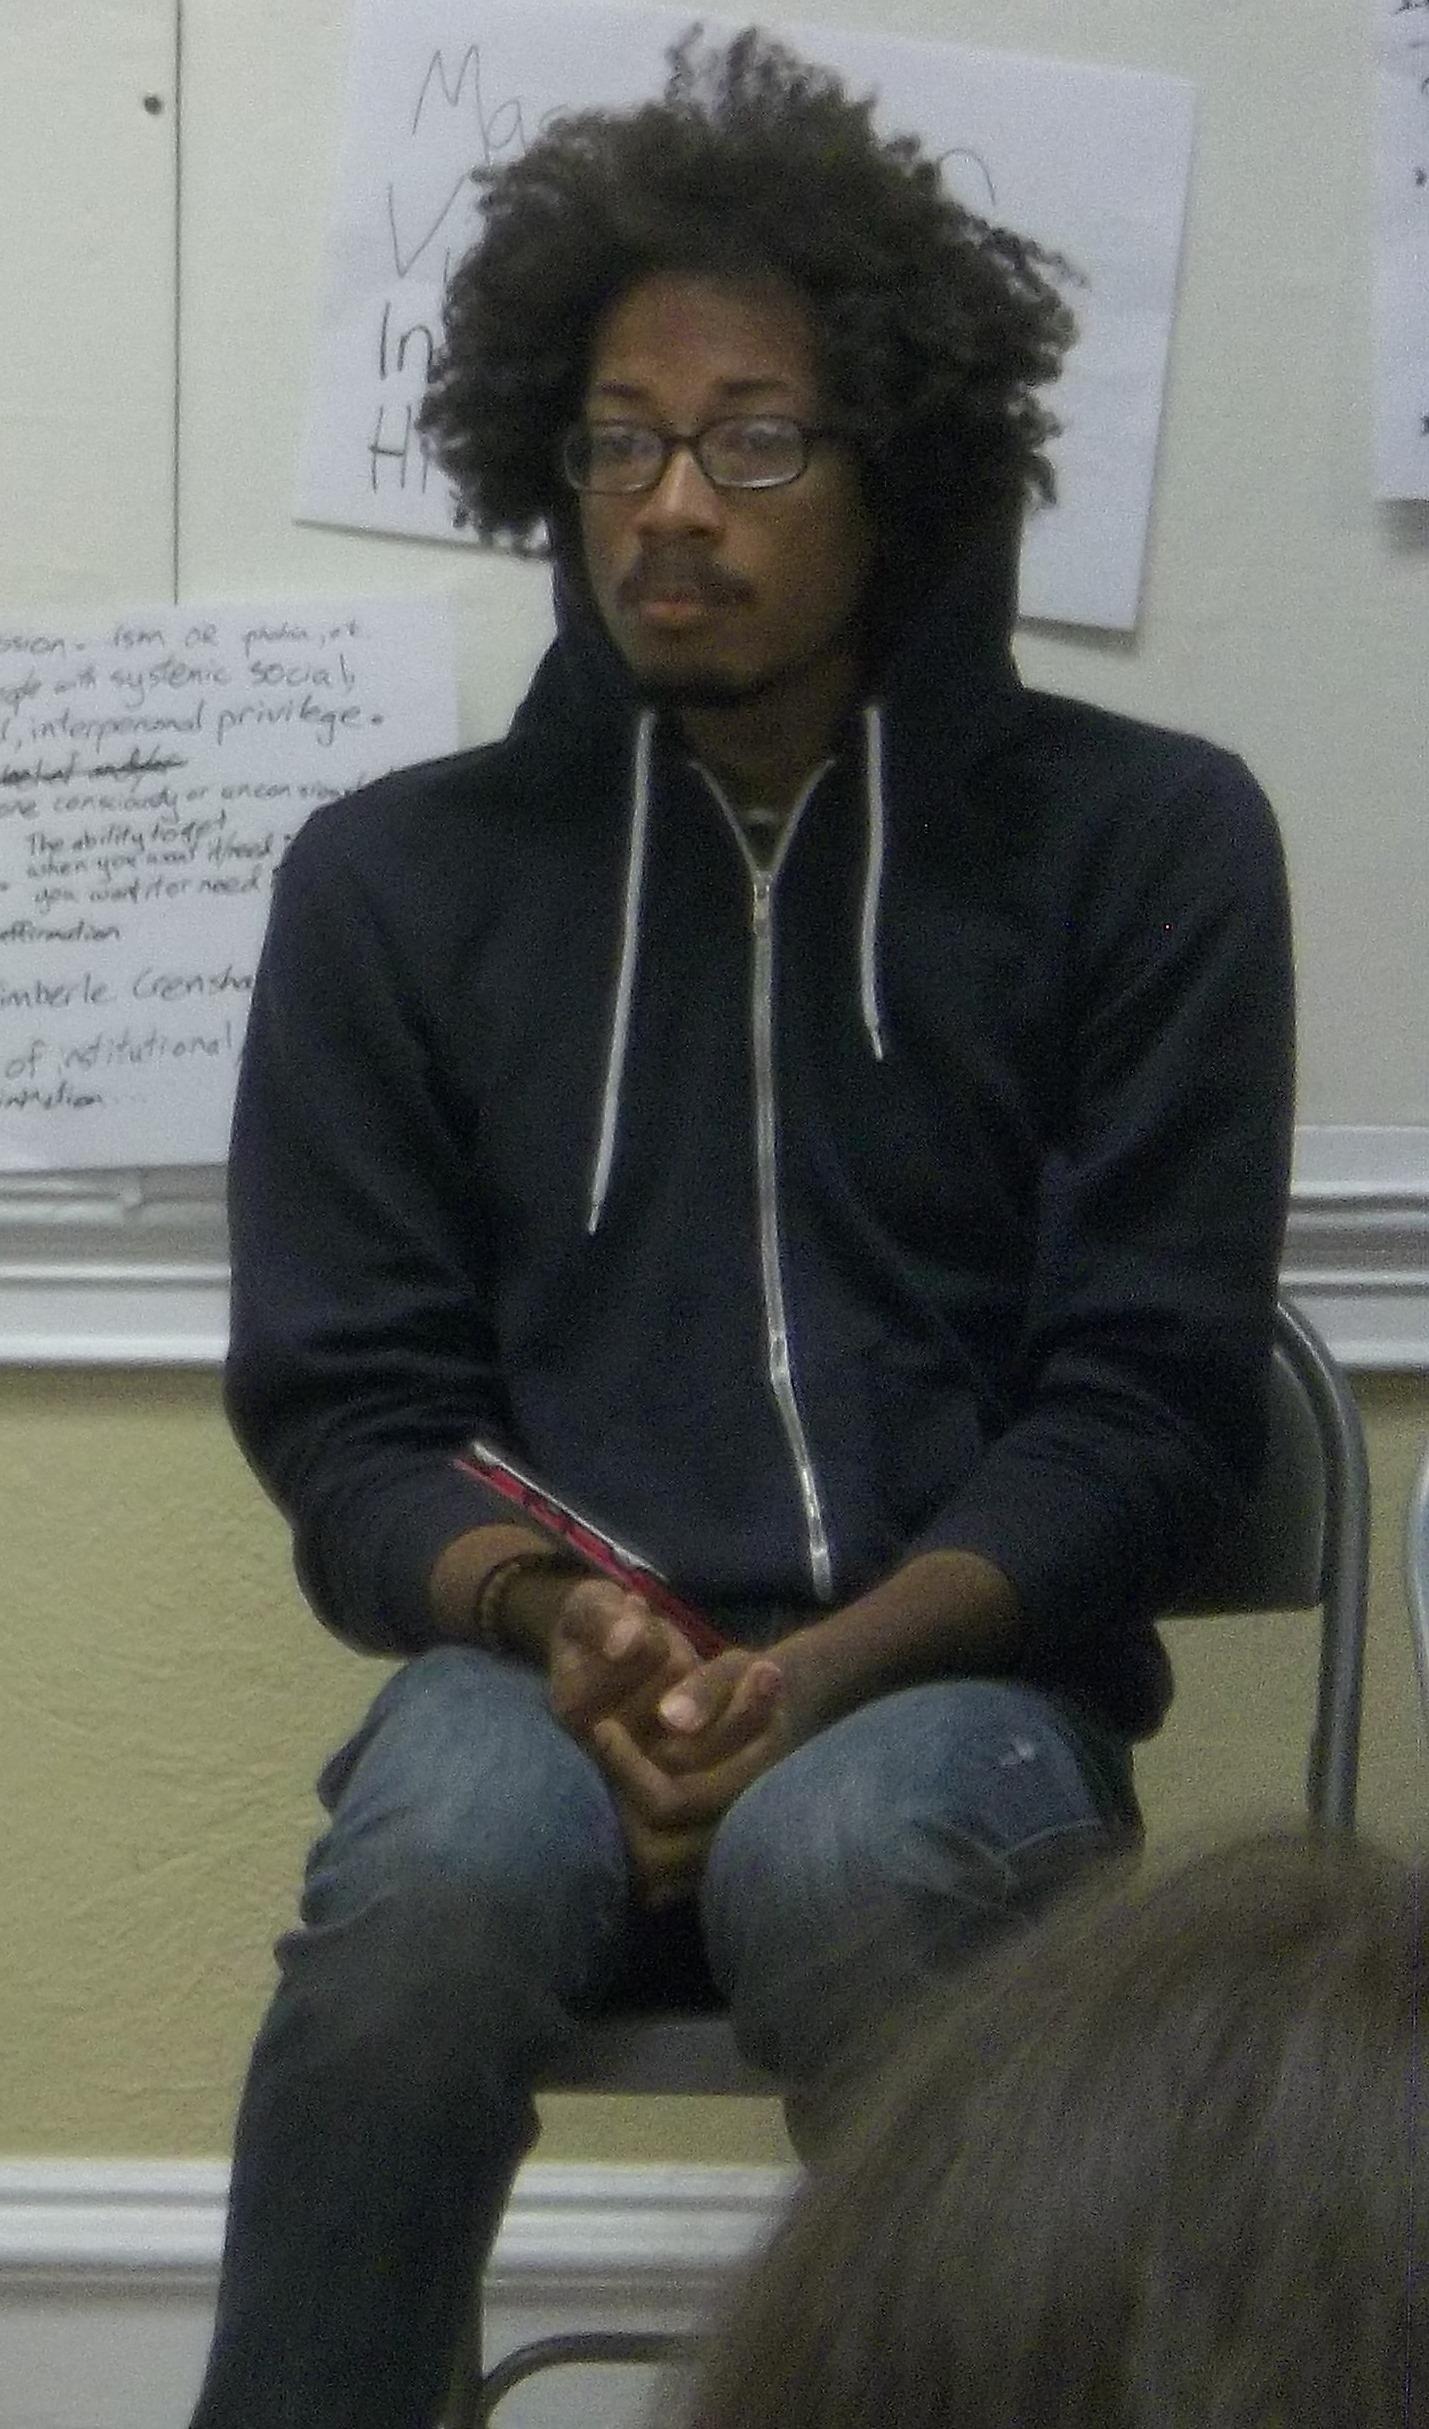 Malik Listening Intently as He Facilitates